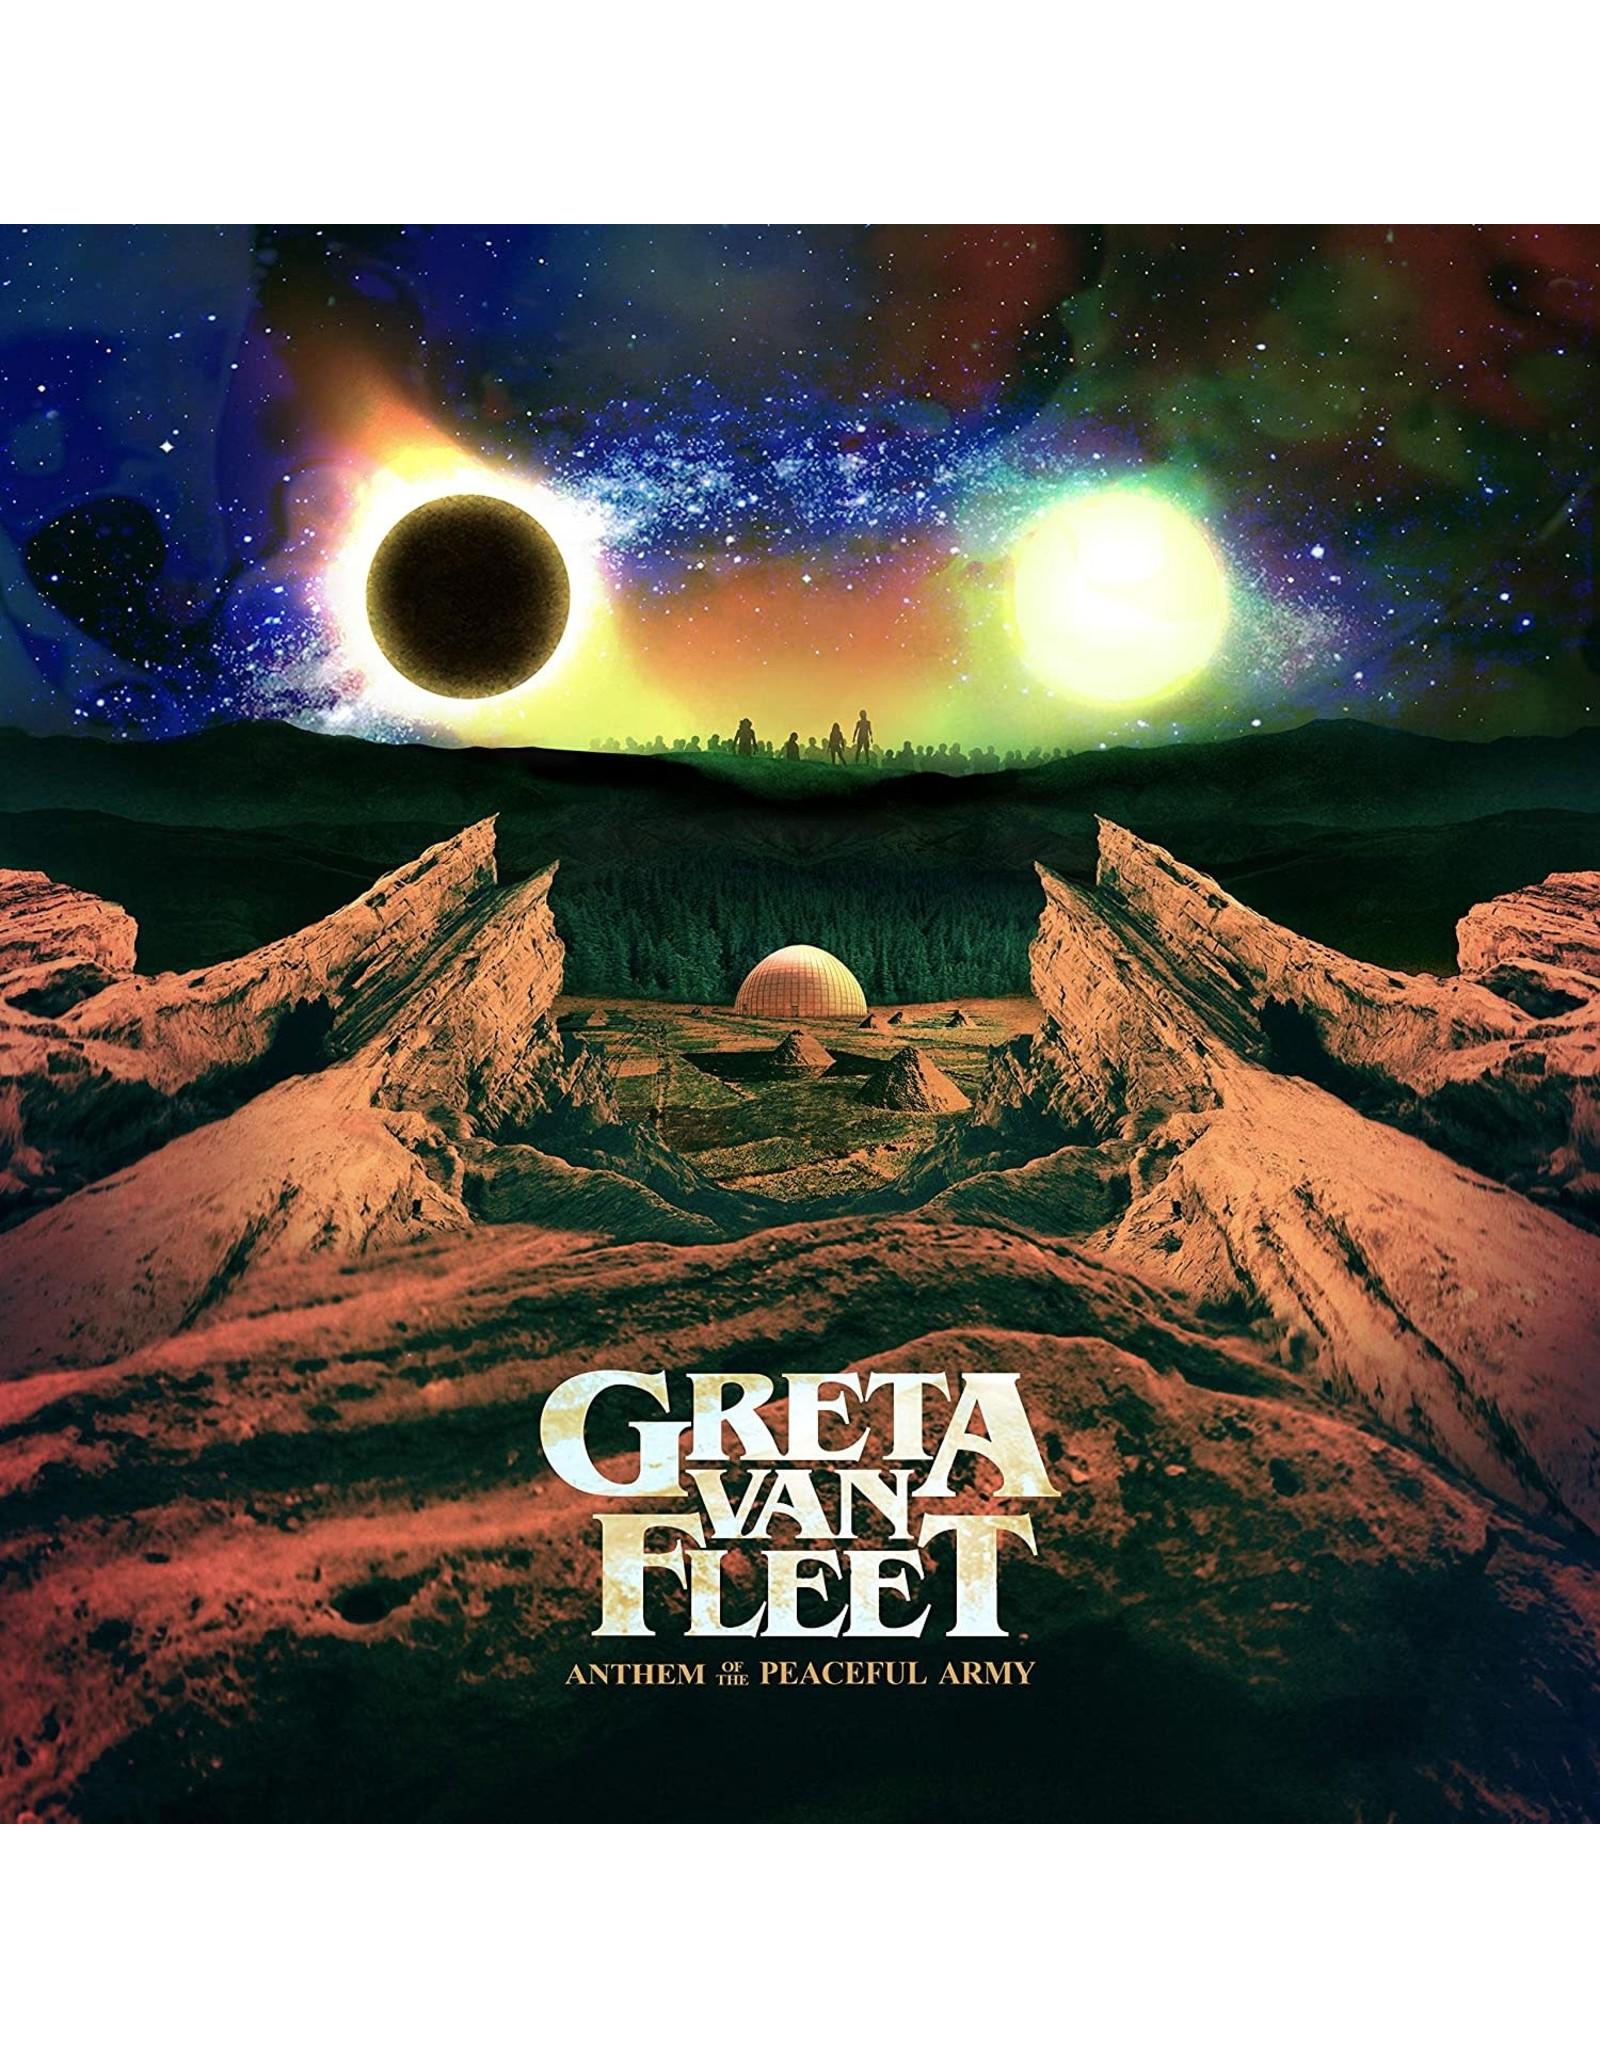 Greta Van Fleet - Anthem of the Peaceful Army LP